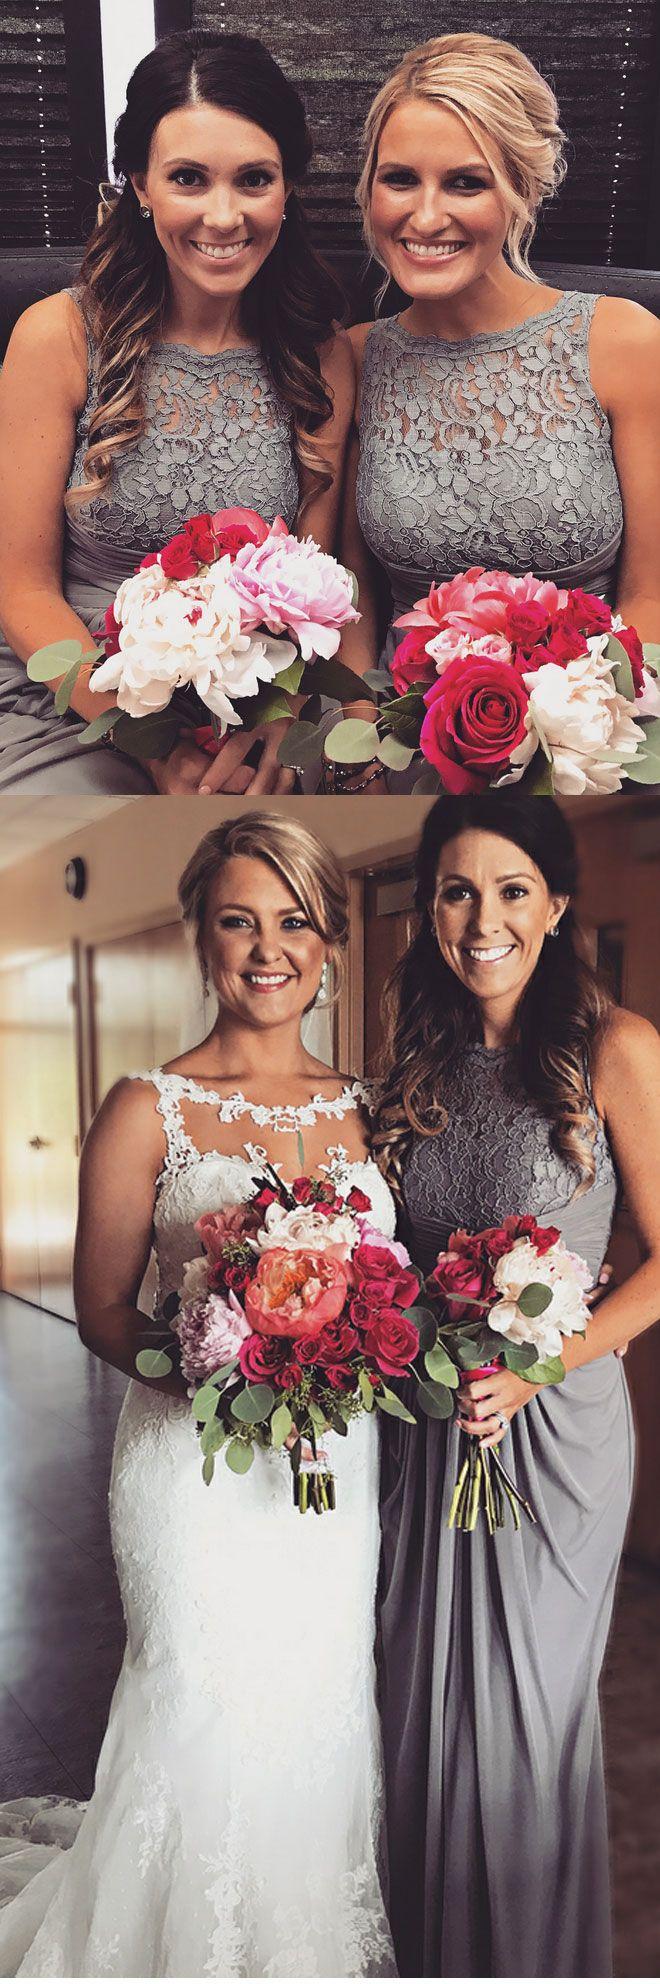 grey bridesmaid dress with lace, chiffon long bridesmaid gowns